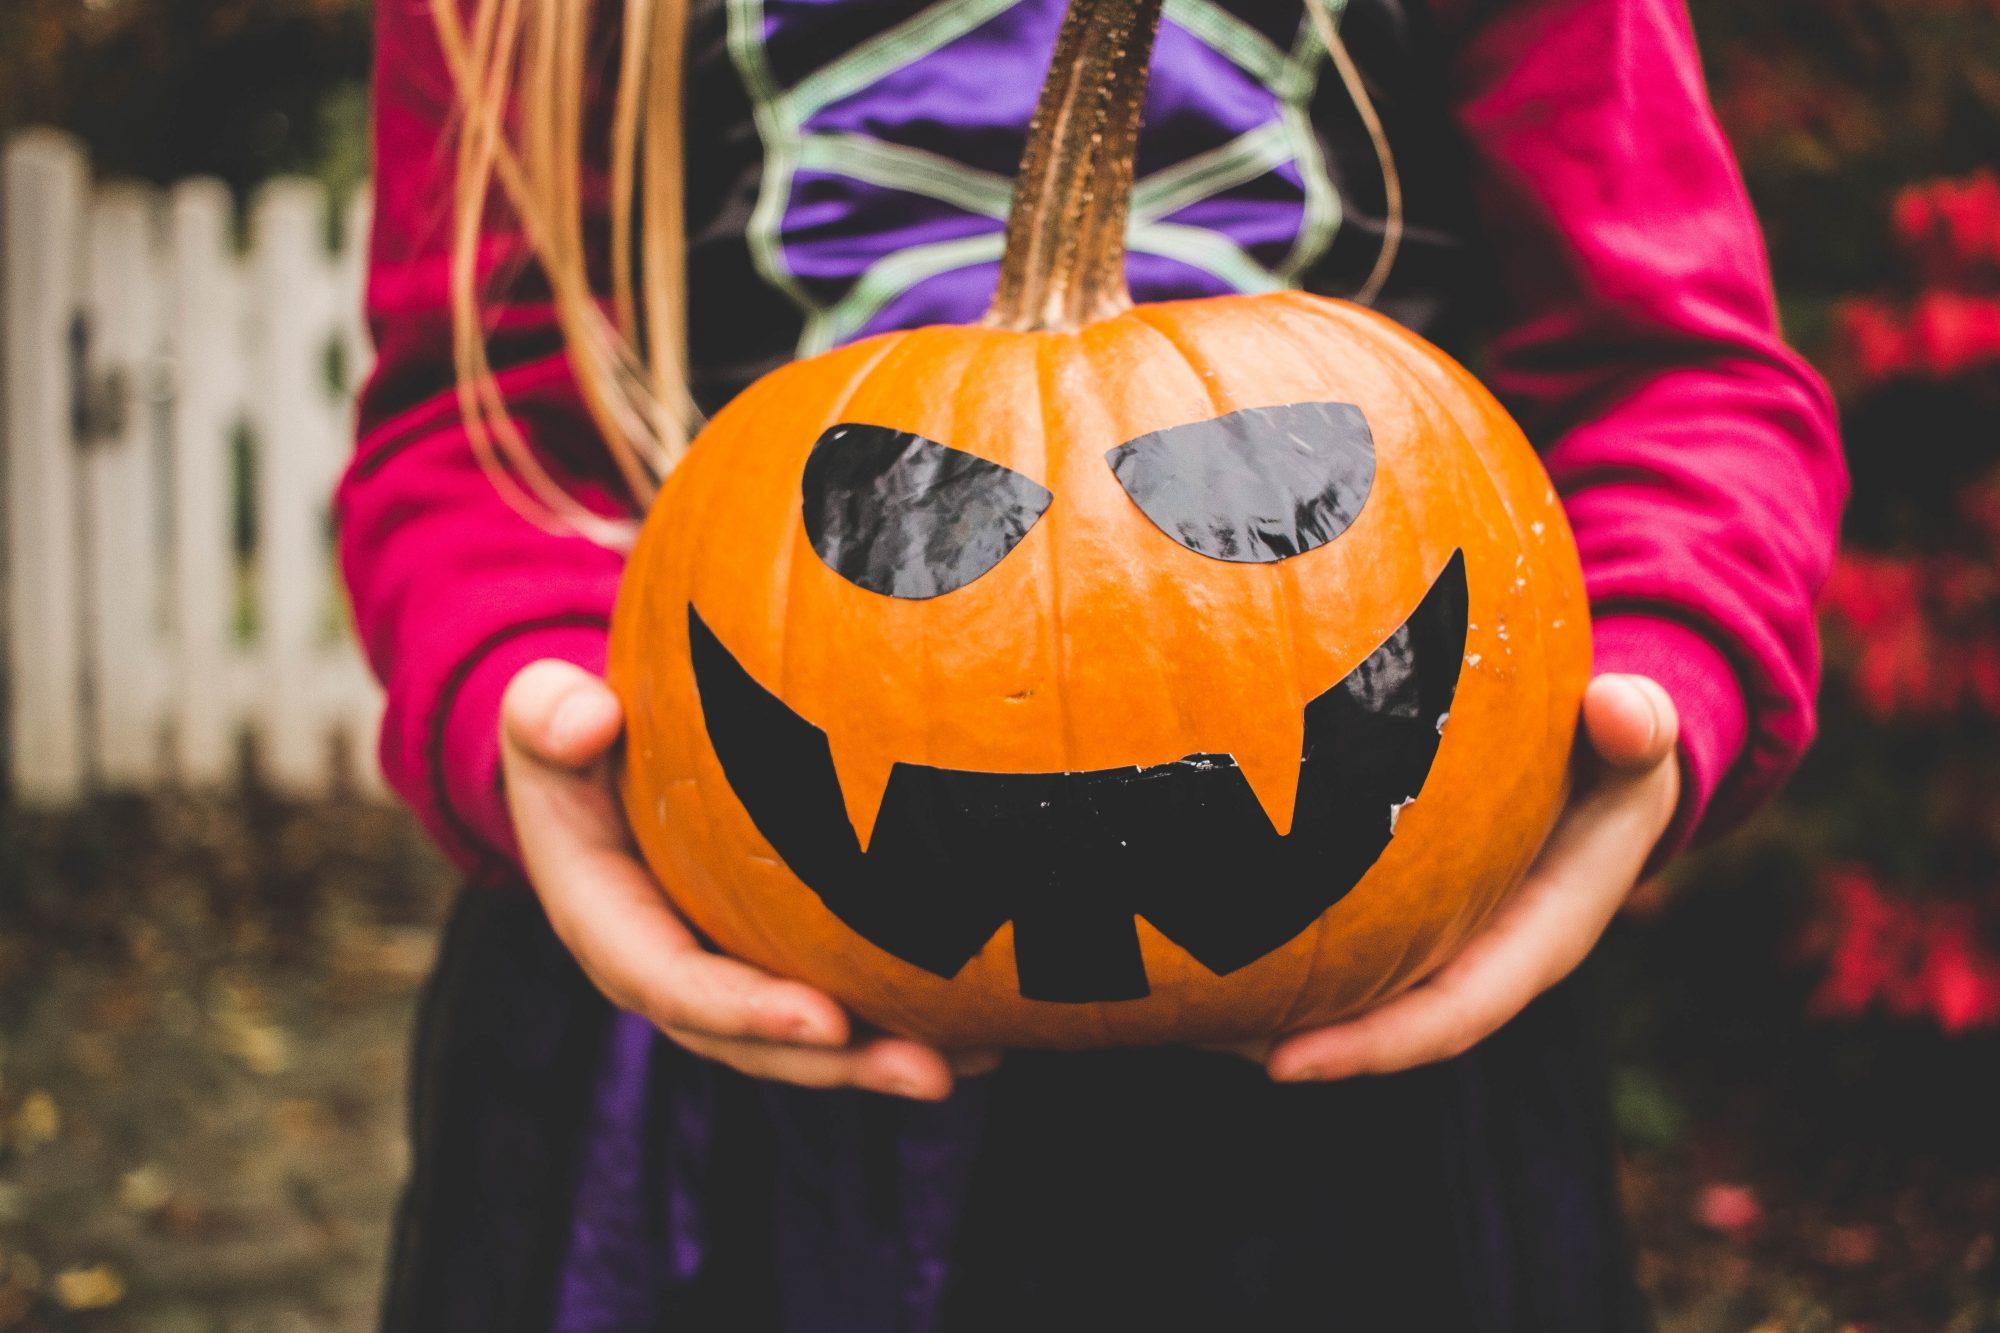 child-holding-decorated-pumpkin